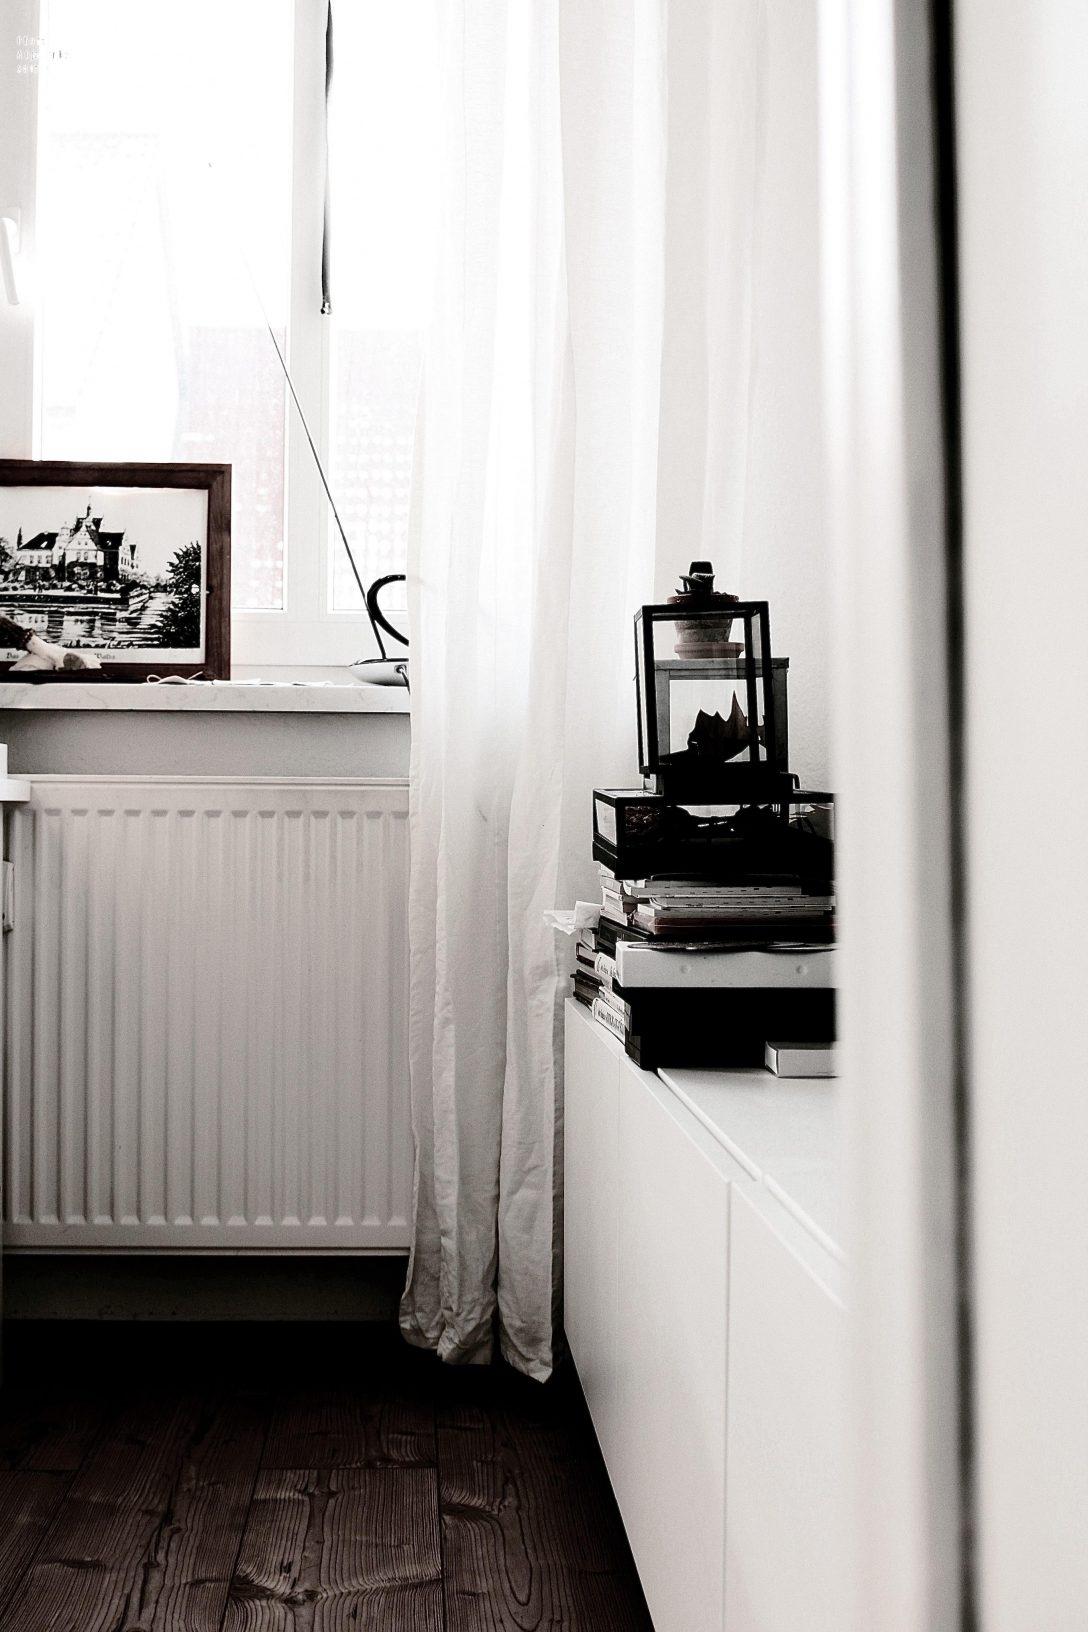 Large Size of Heizkörper Wohnzimmer Verkleiden Heizkörper Für Wohnzimmer Design Heizkörper Wohnzimmer Kermi Heizkörper Edelstahl Wohnzimmer Wohnzimmer Heizkörper Wohnzimmer